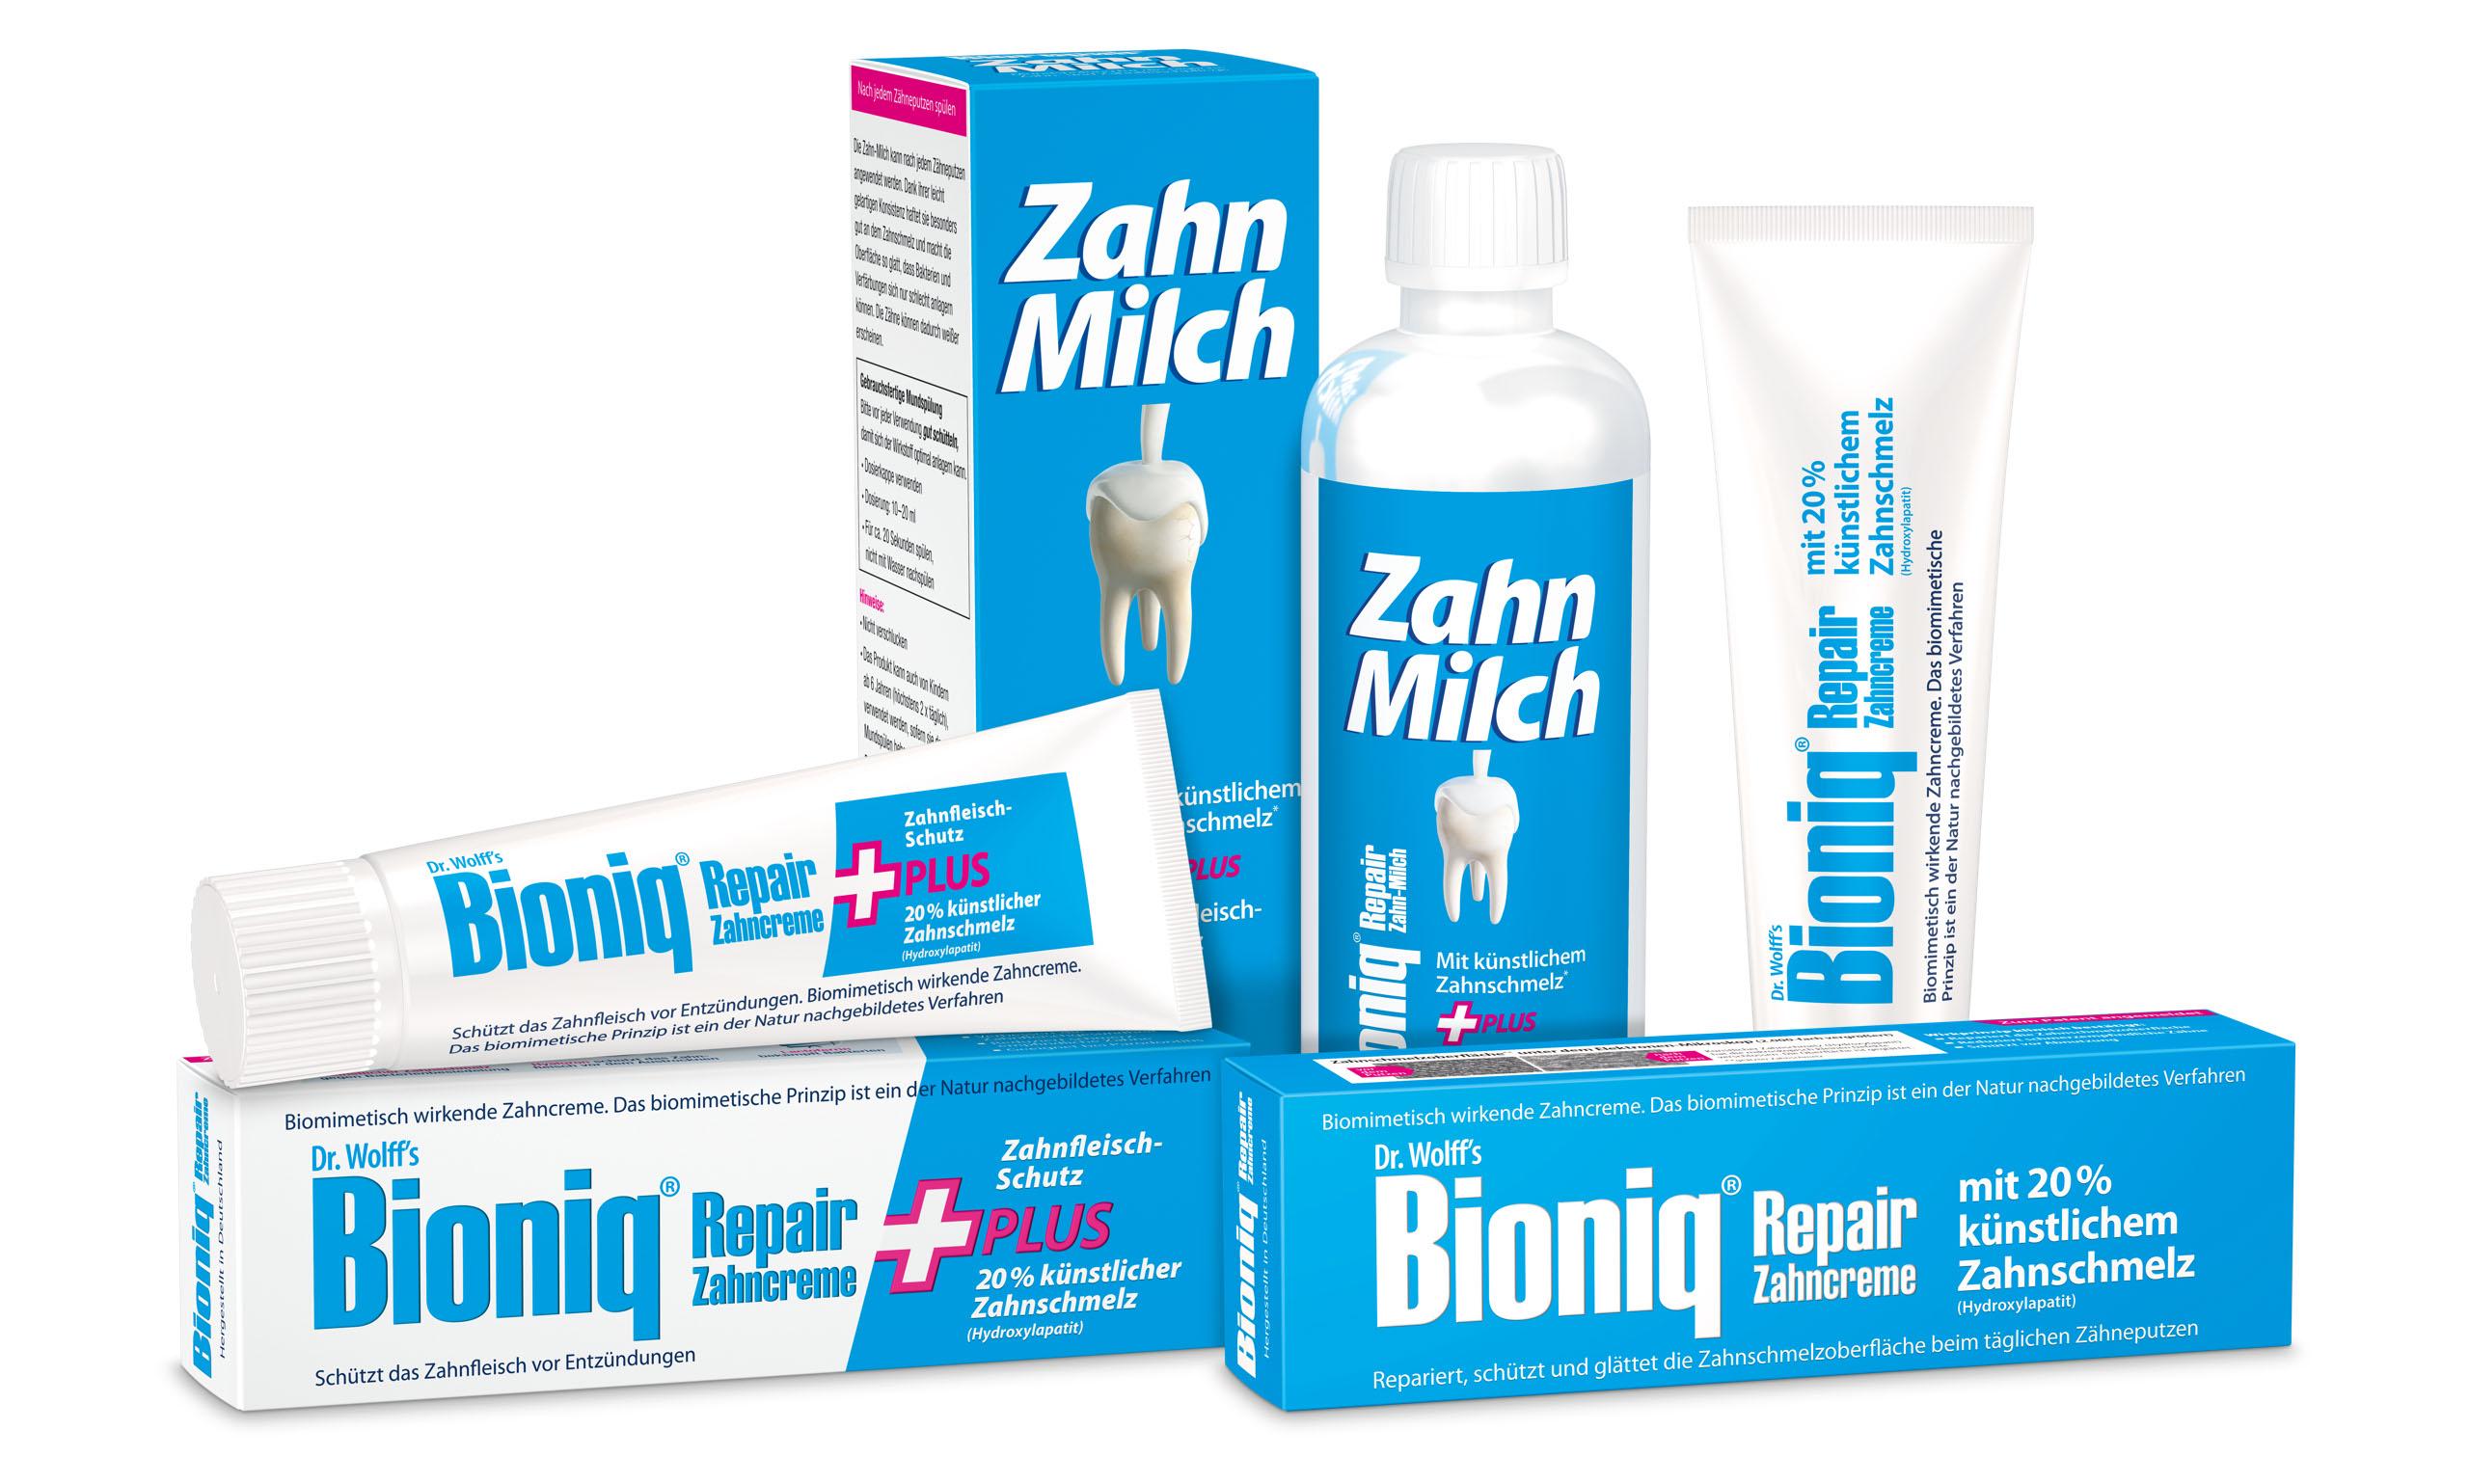 Bioniq Repair-Zahncreme, Bioniq Repair-Zahncreme Plus und Bioniq Repair Zahn-Milch